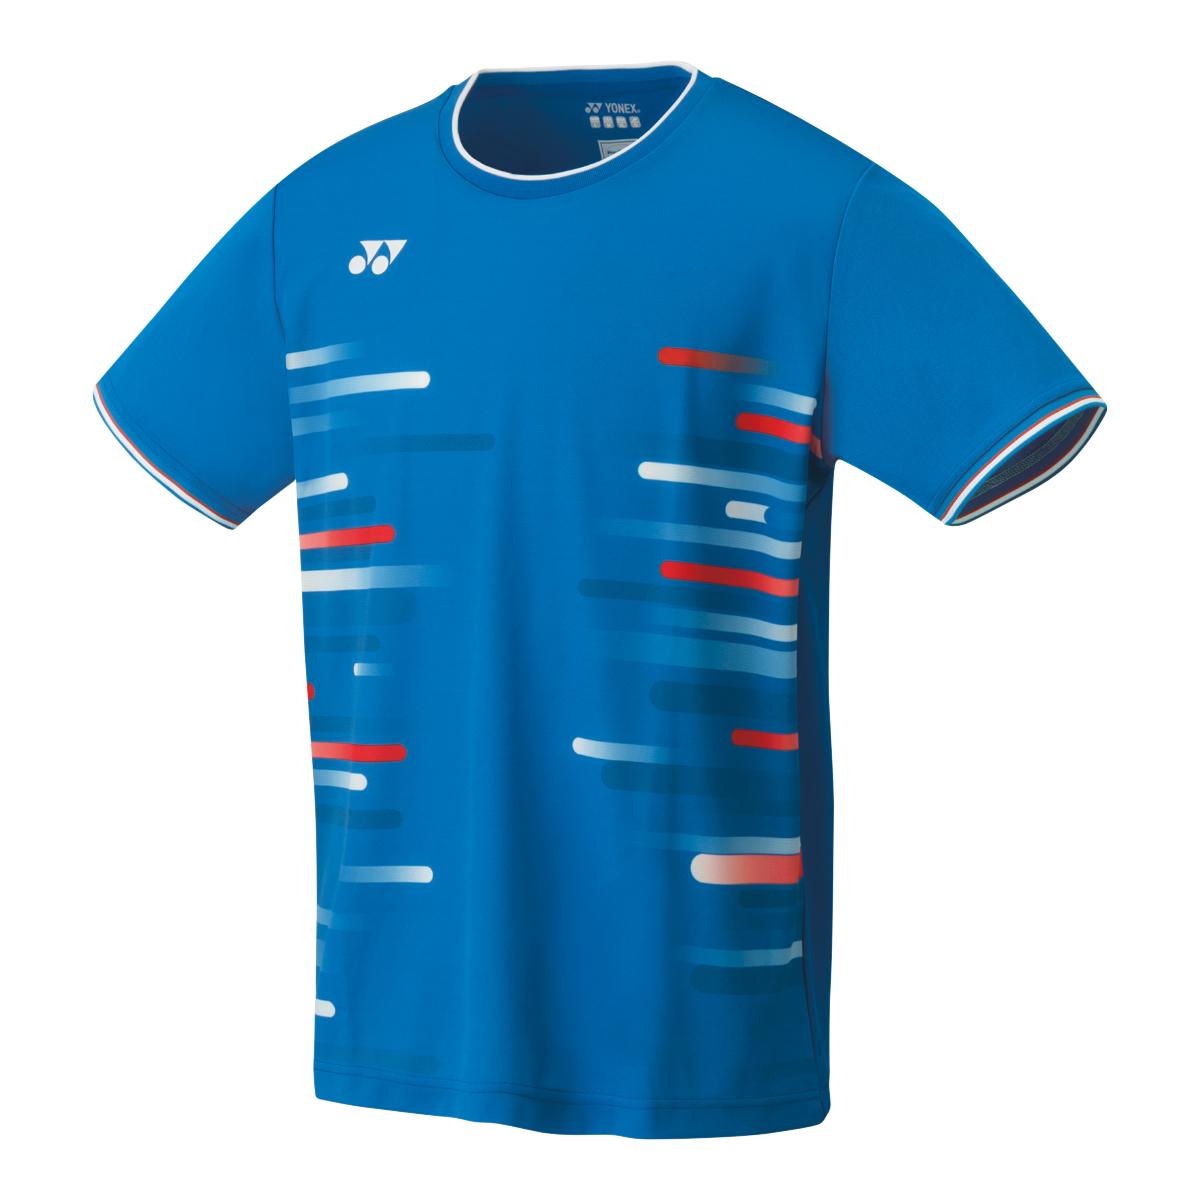 YONEX - Men's Crew Neck Shirt #10286Detailbild - 3